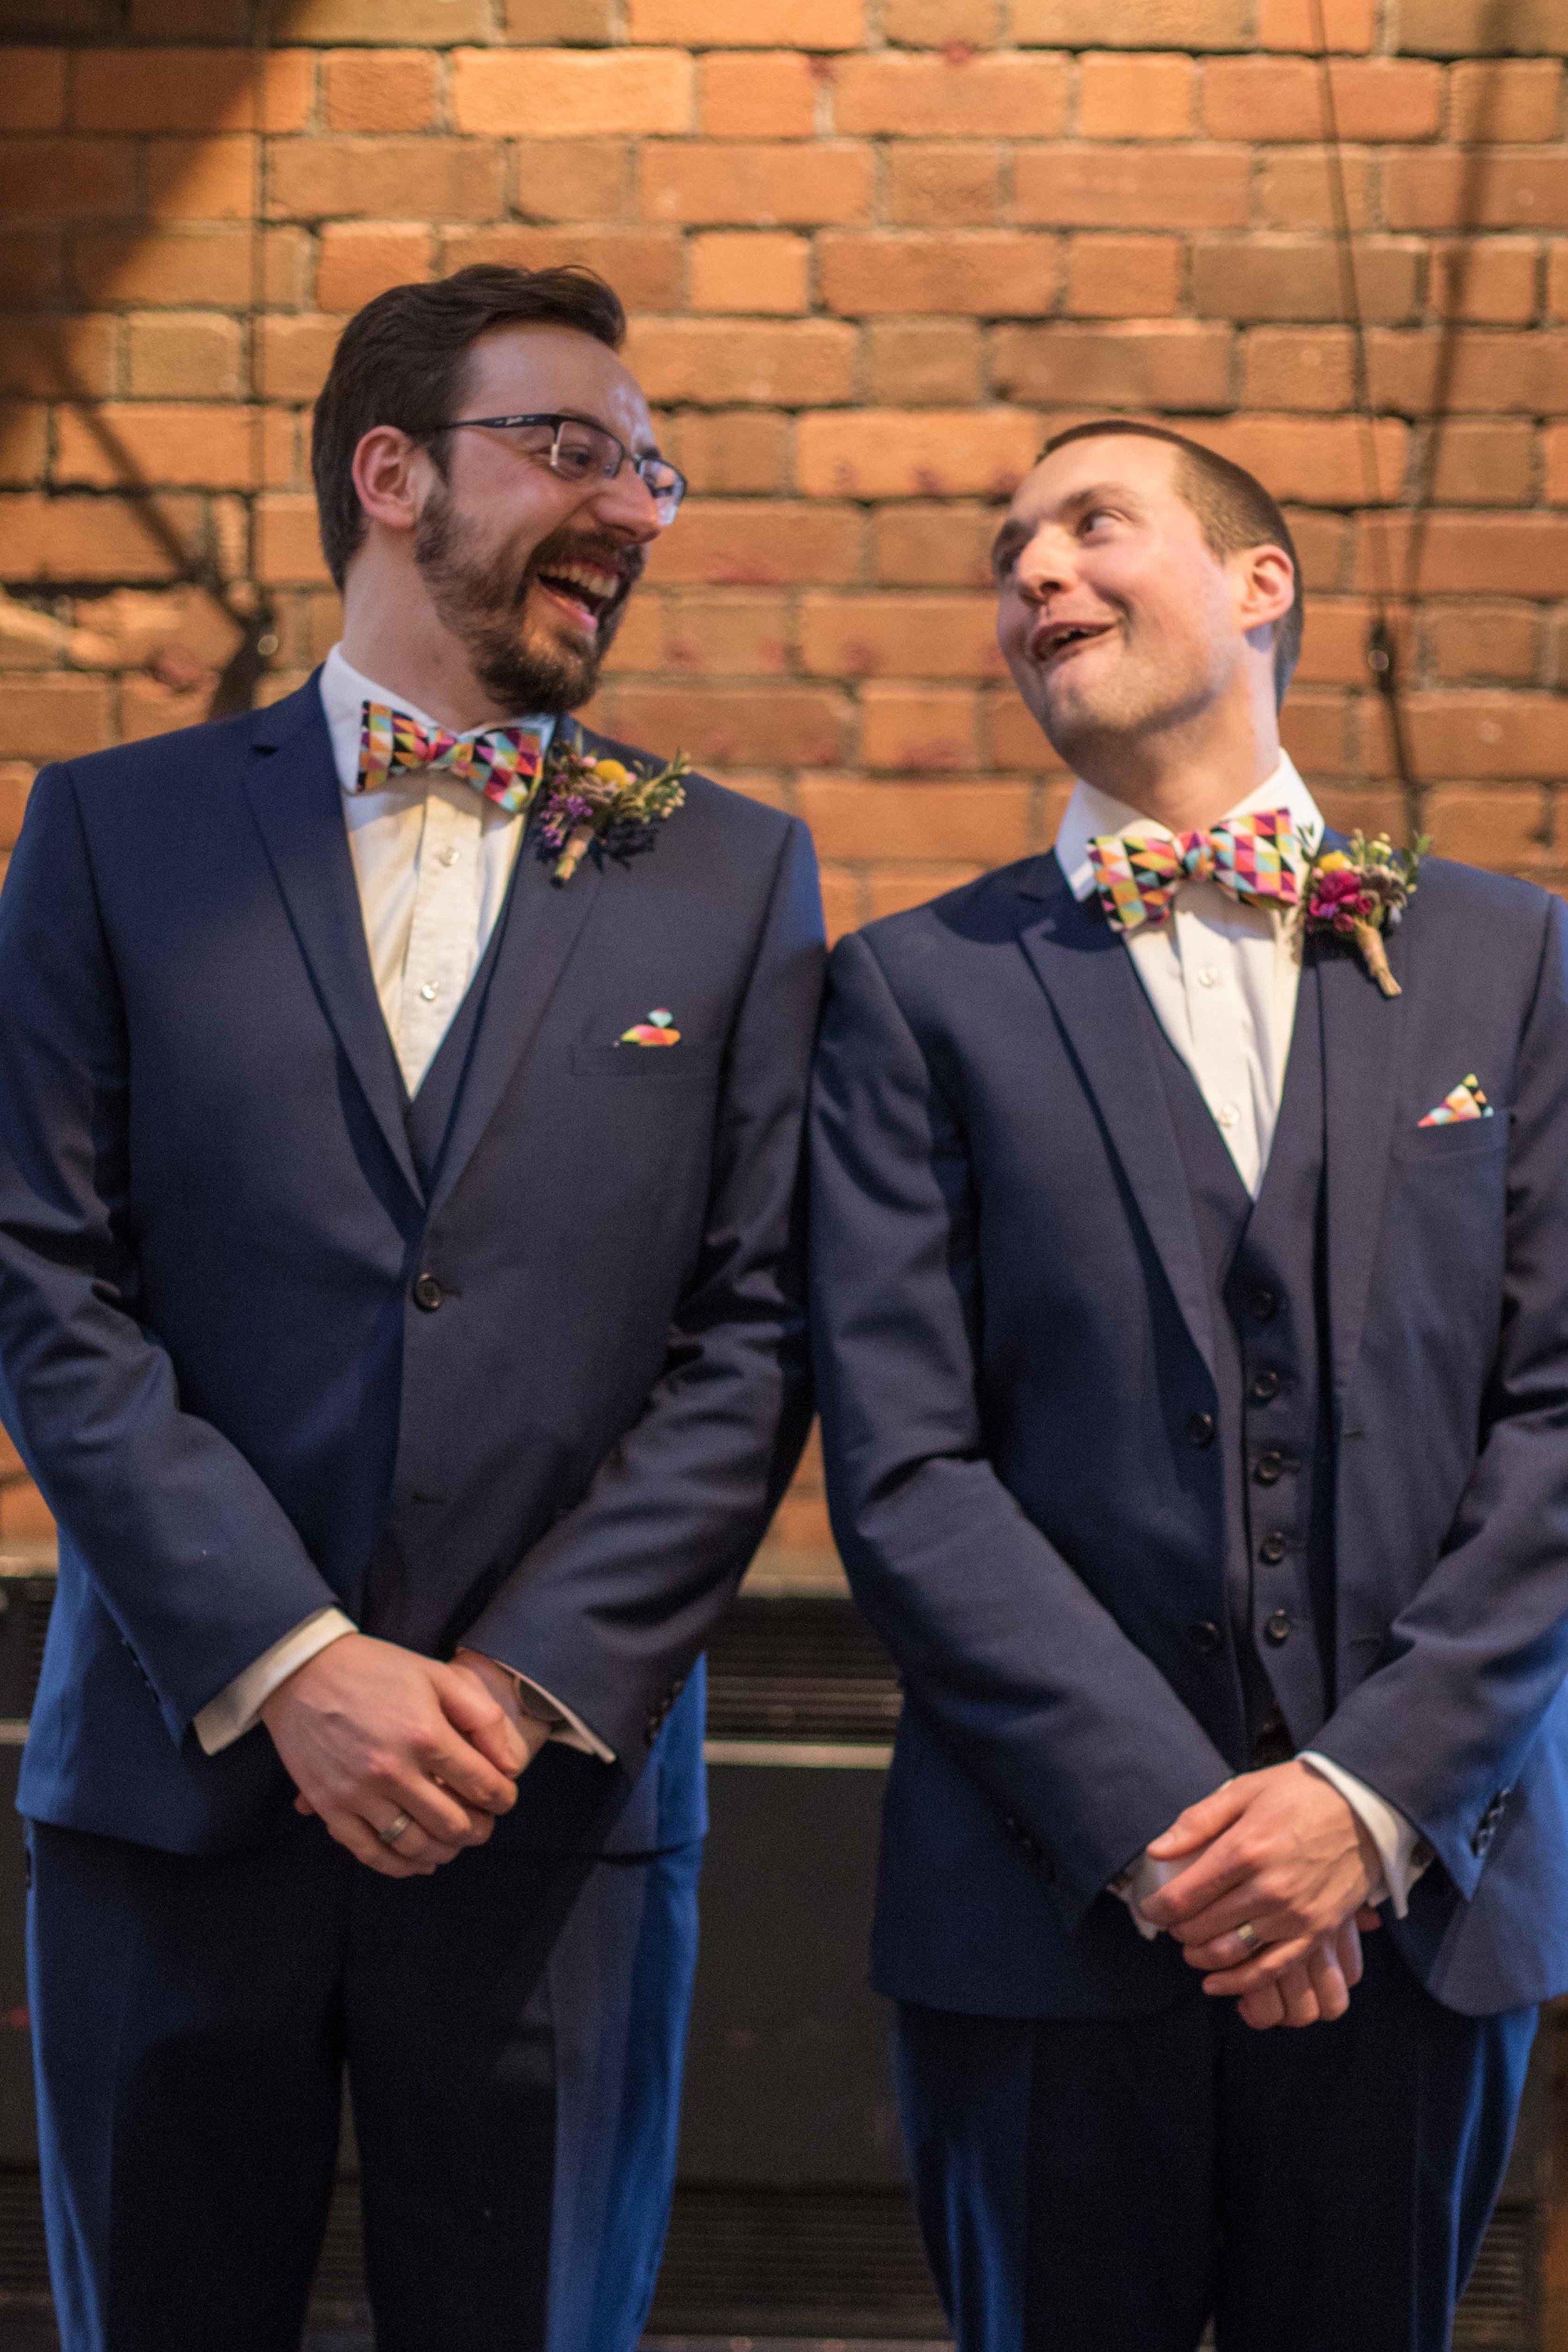 Adam & Faye - Wright Wedding Photography - Bristol Wedding Photographer -224.jpg